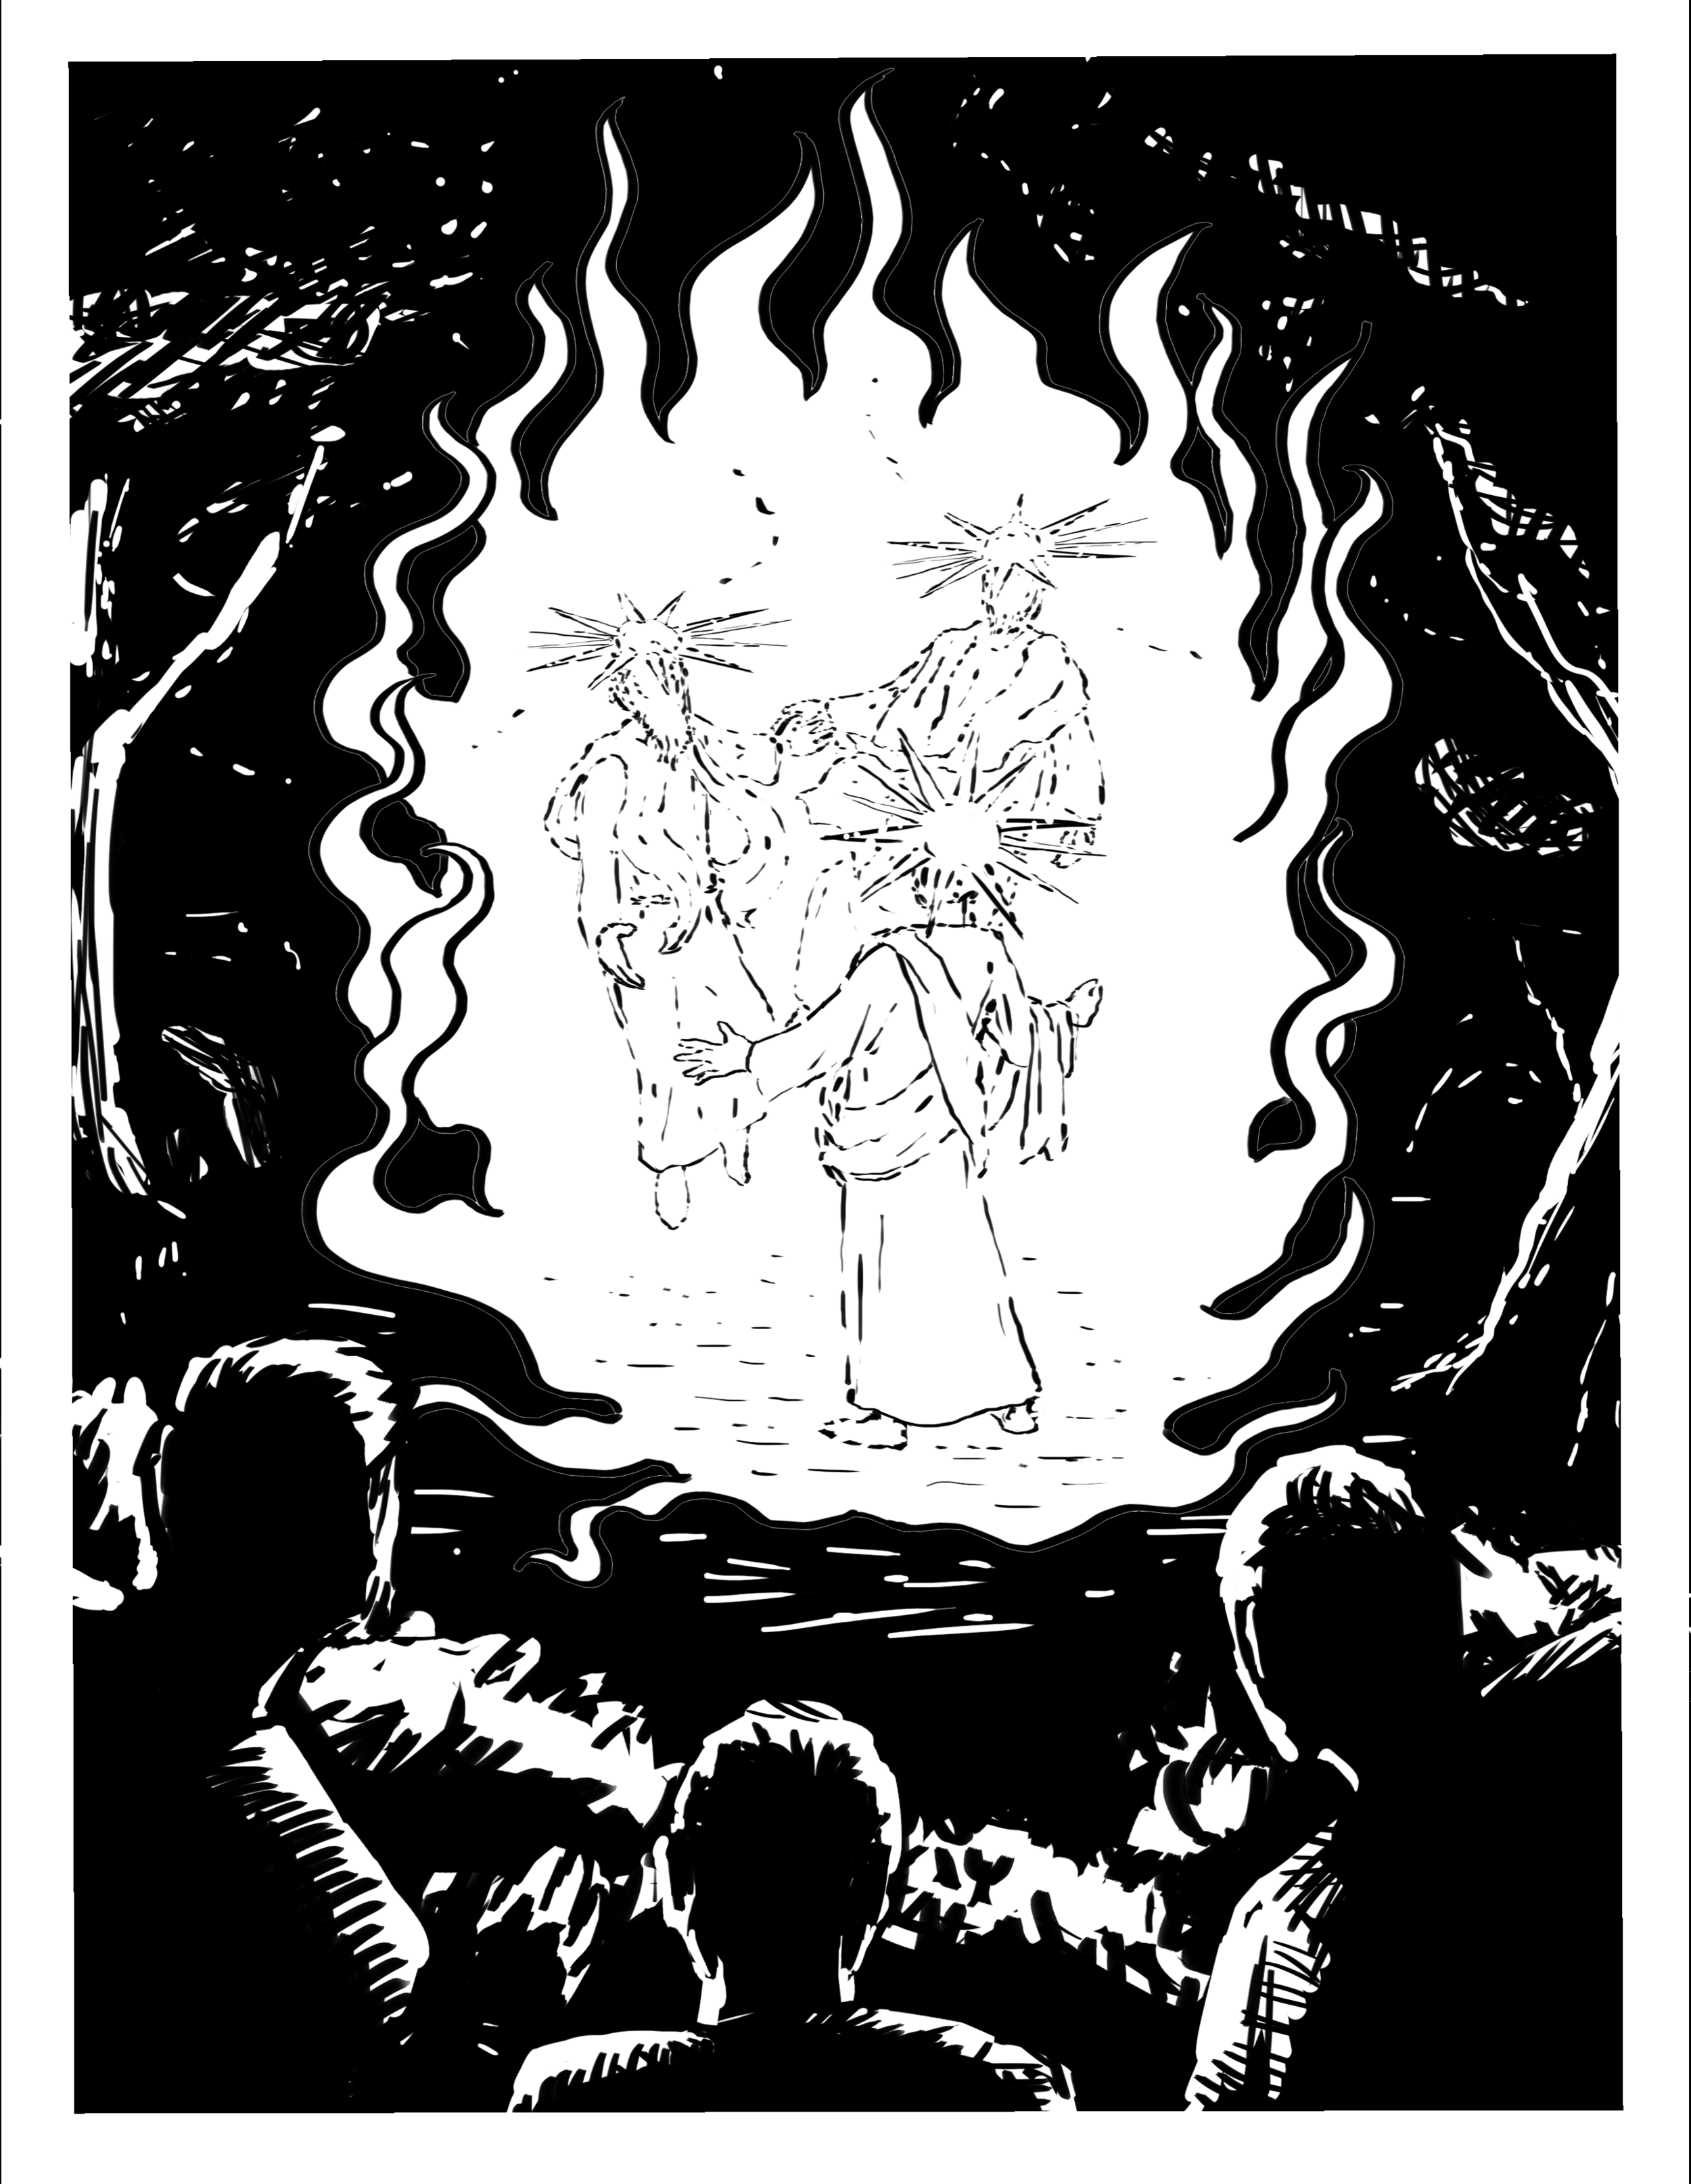 Lent-Illustrations-ColoringArtboard-6.png